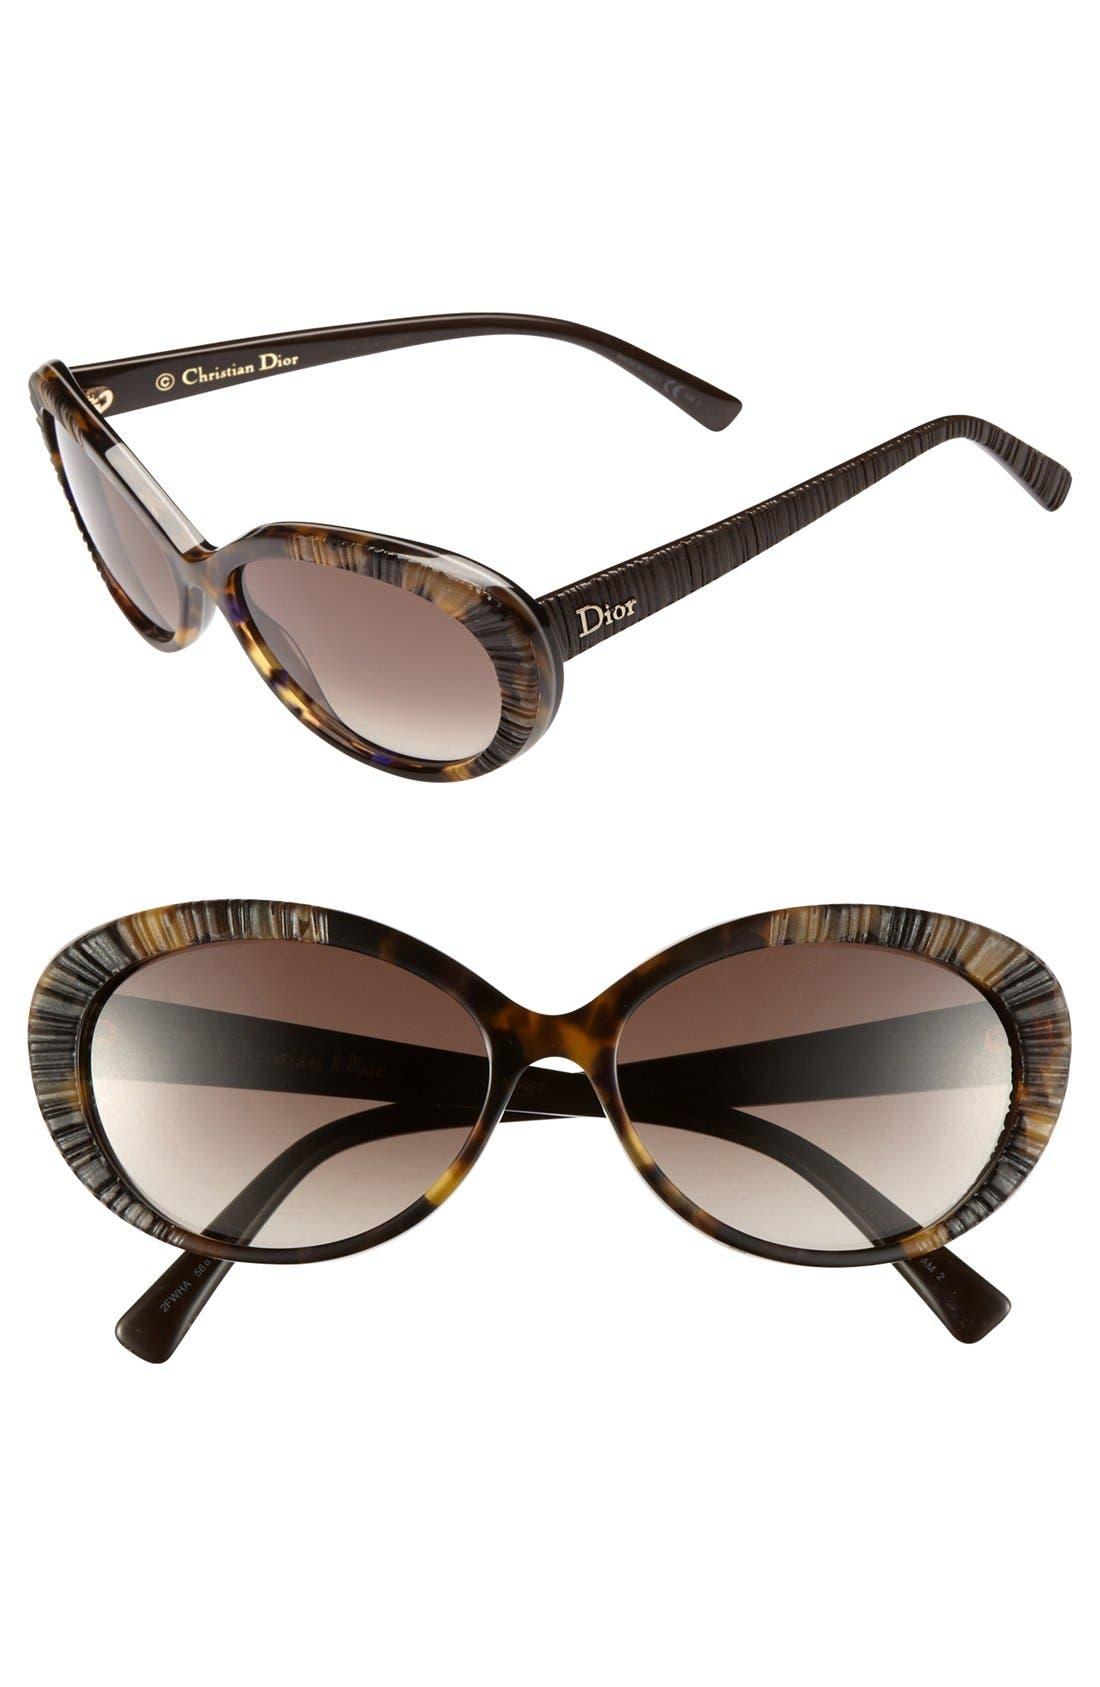 Alternate Image 1 Selected - Christian Dior 'Taffeta 3/S' 56mm Sunglasses